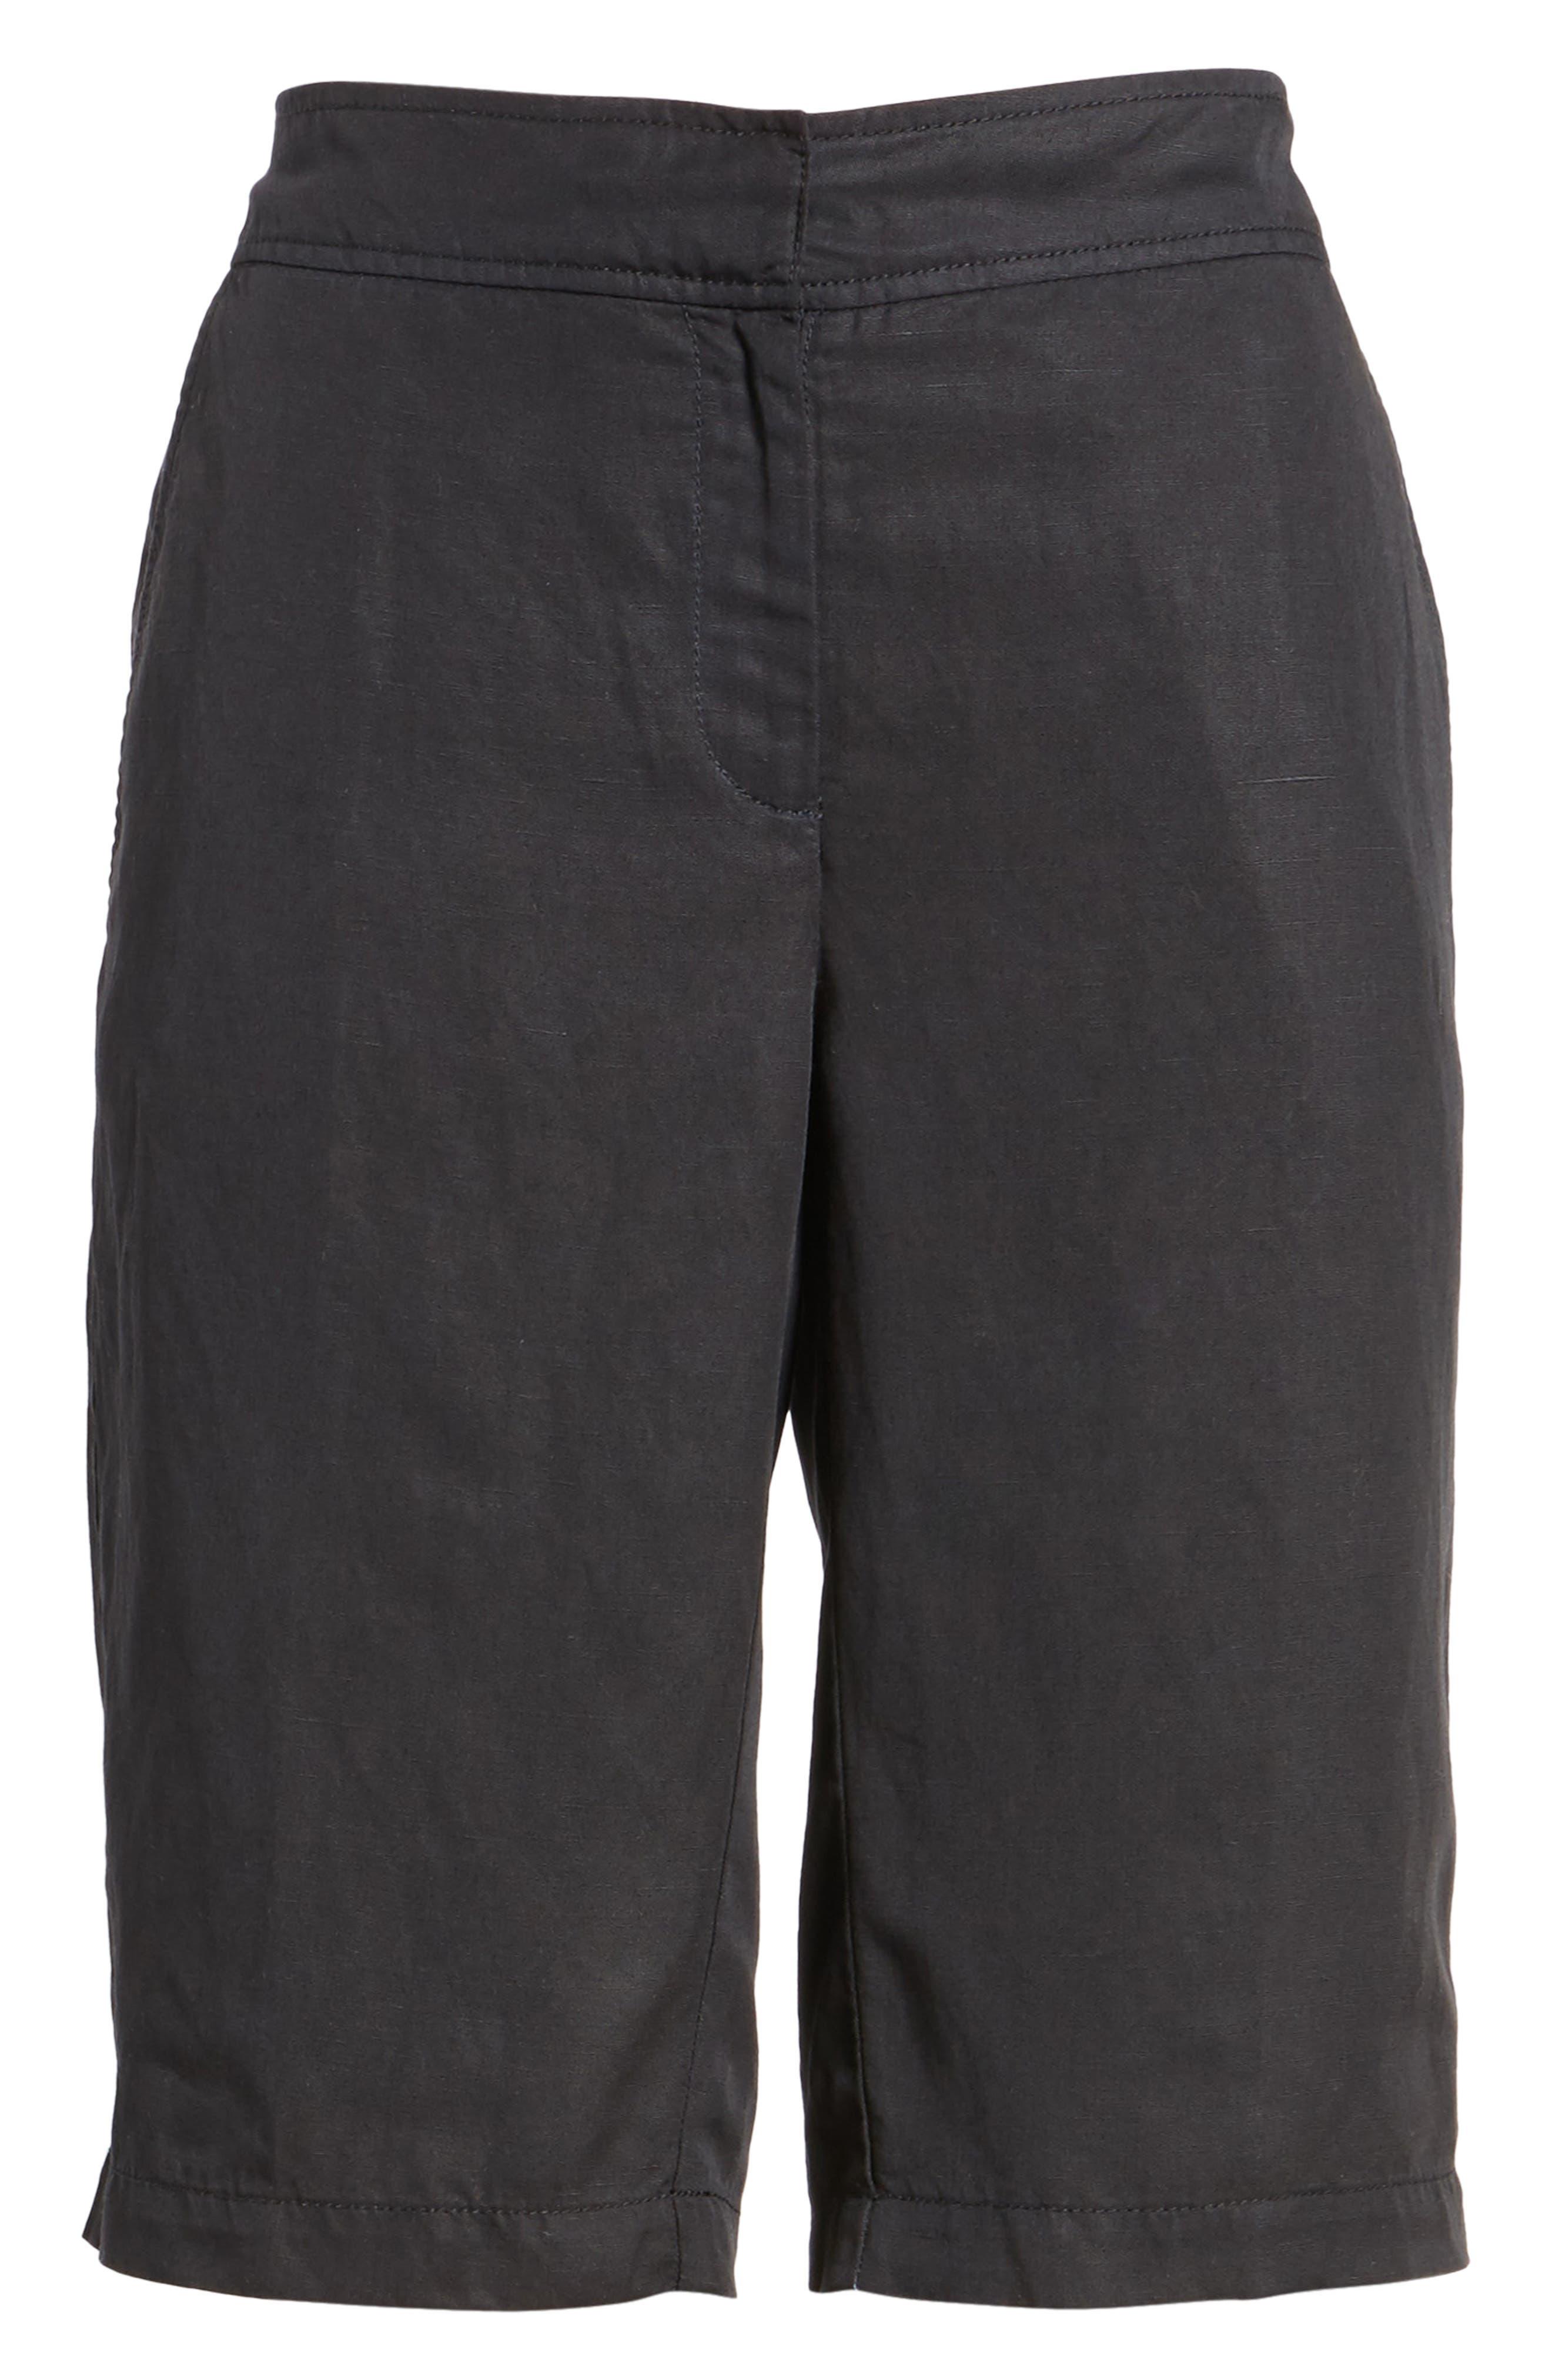 Tencel<sup>®</sup> Lyocell & Linen Walking Shorts,                             Alternate thumbnail 6, color,                             001